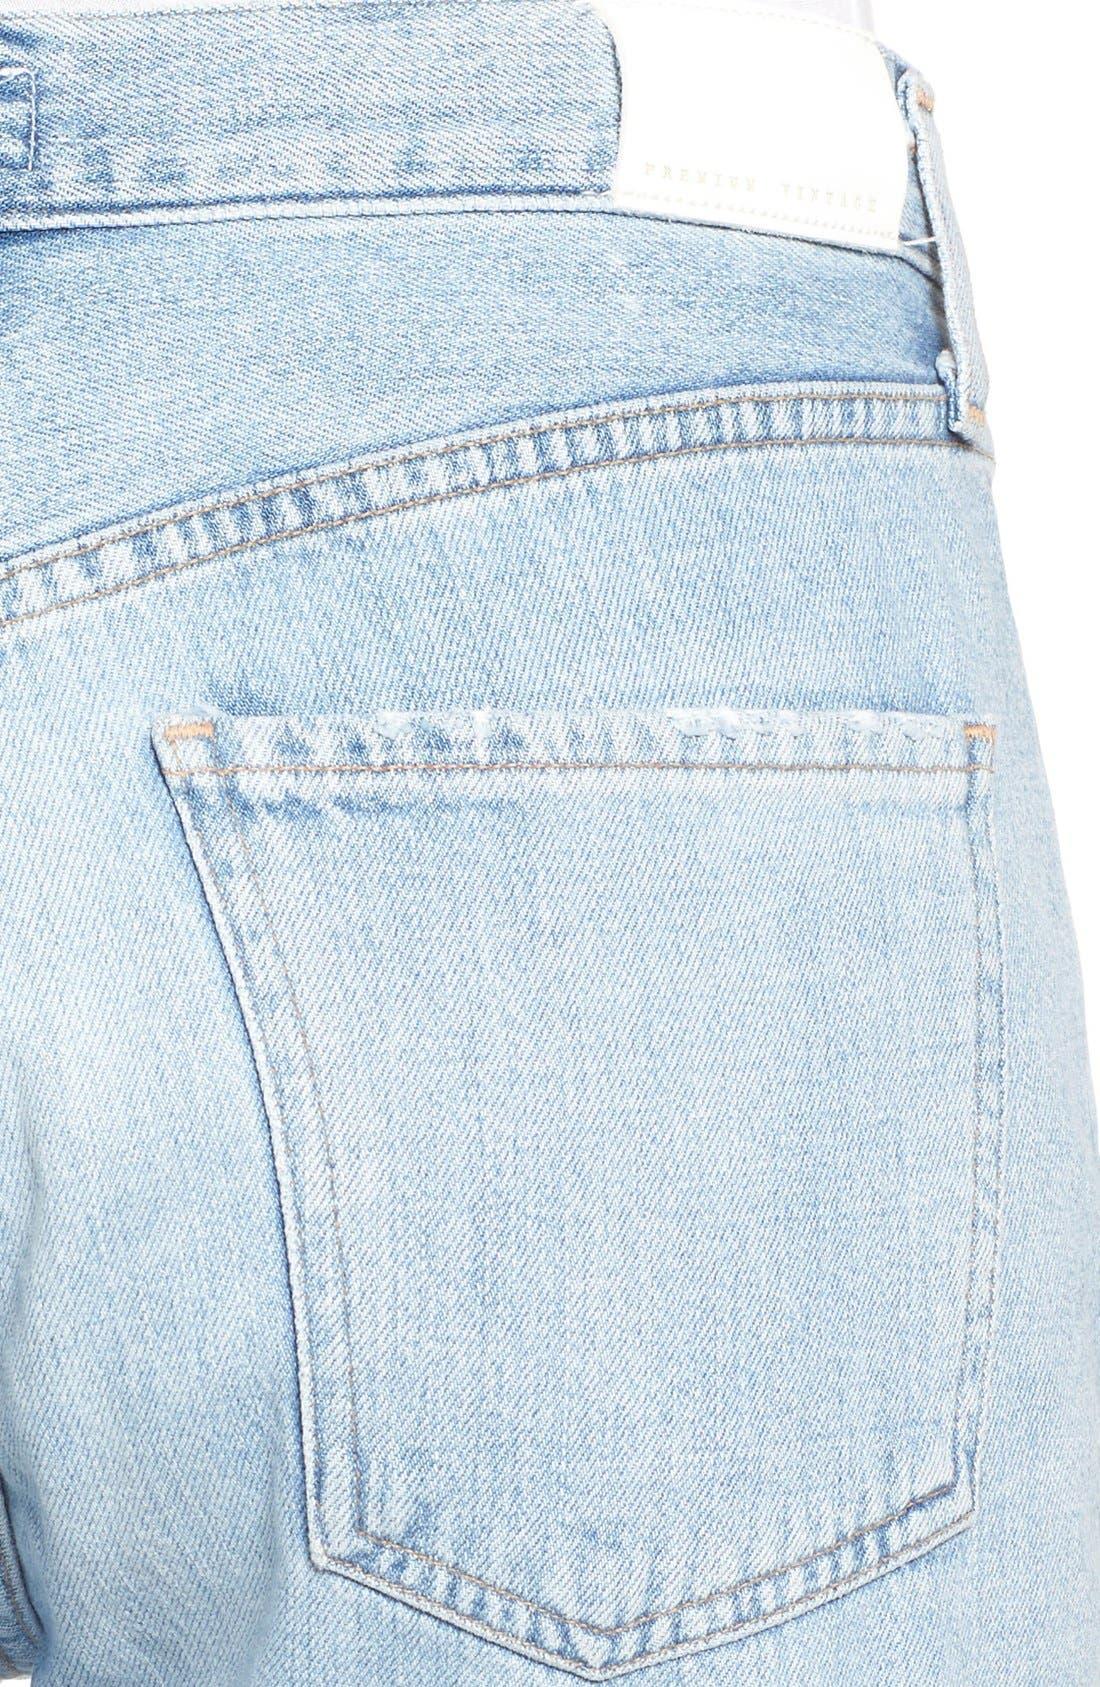 Cora High Waist Released Hem Boyfriend Jeans,                             Alternate thumbnail 5, color,                             454